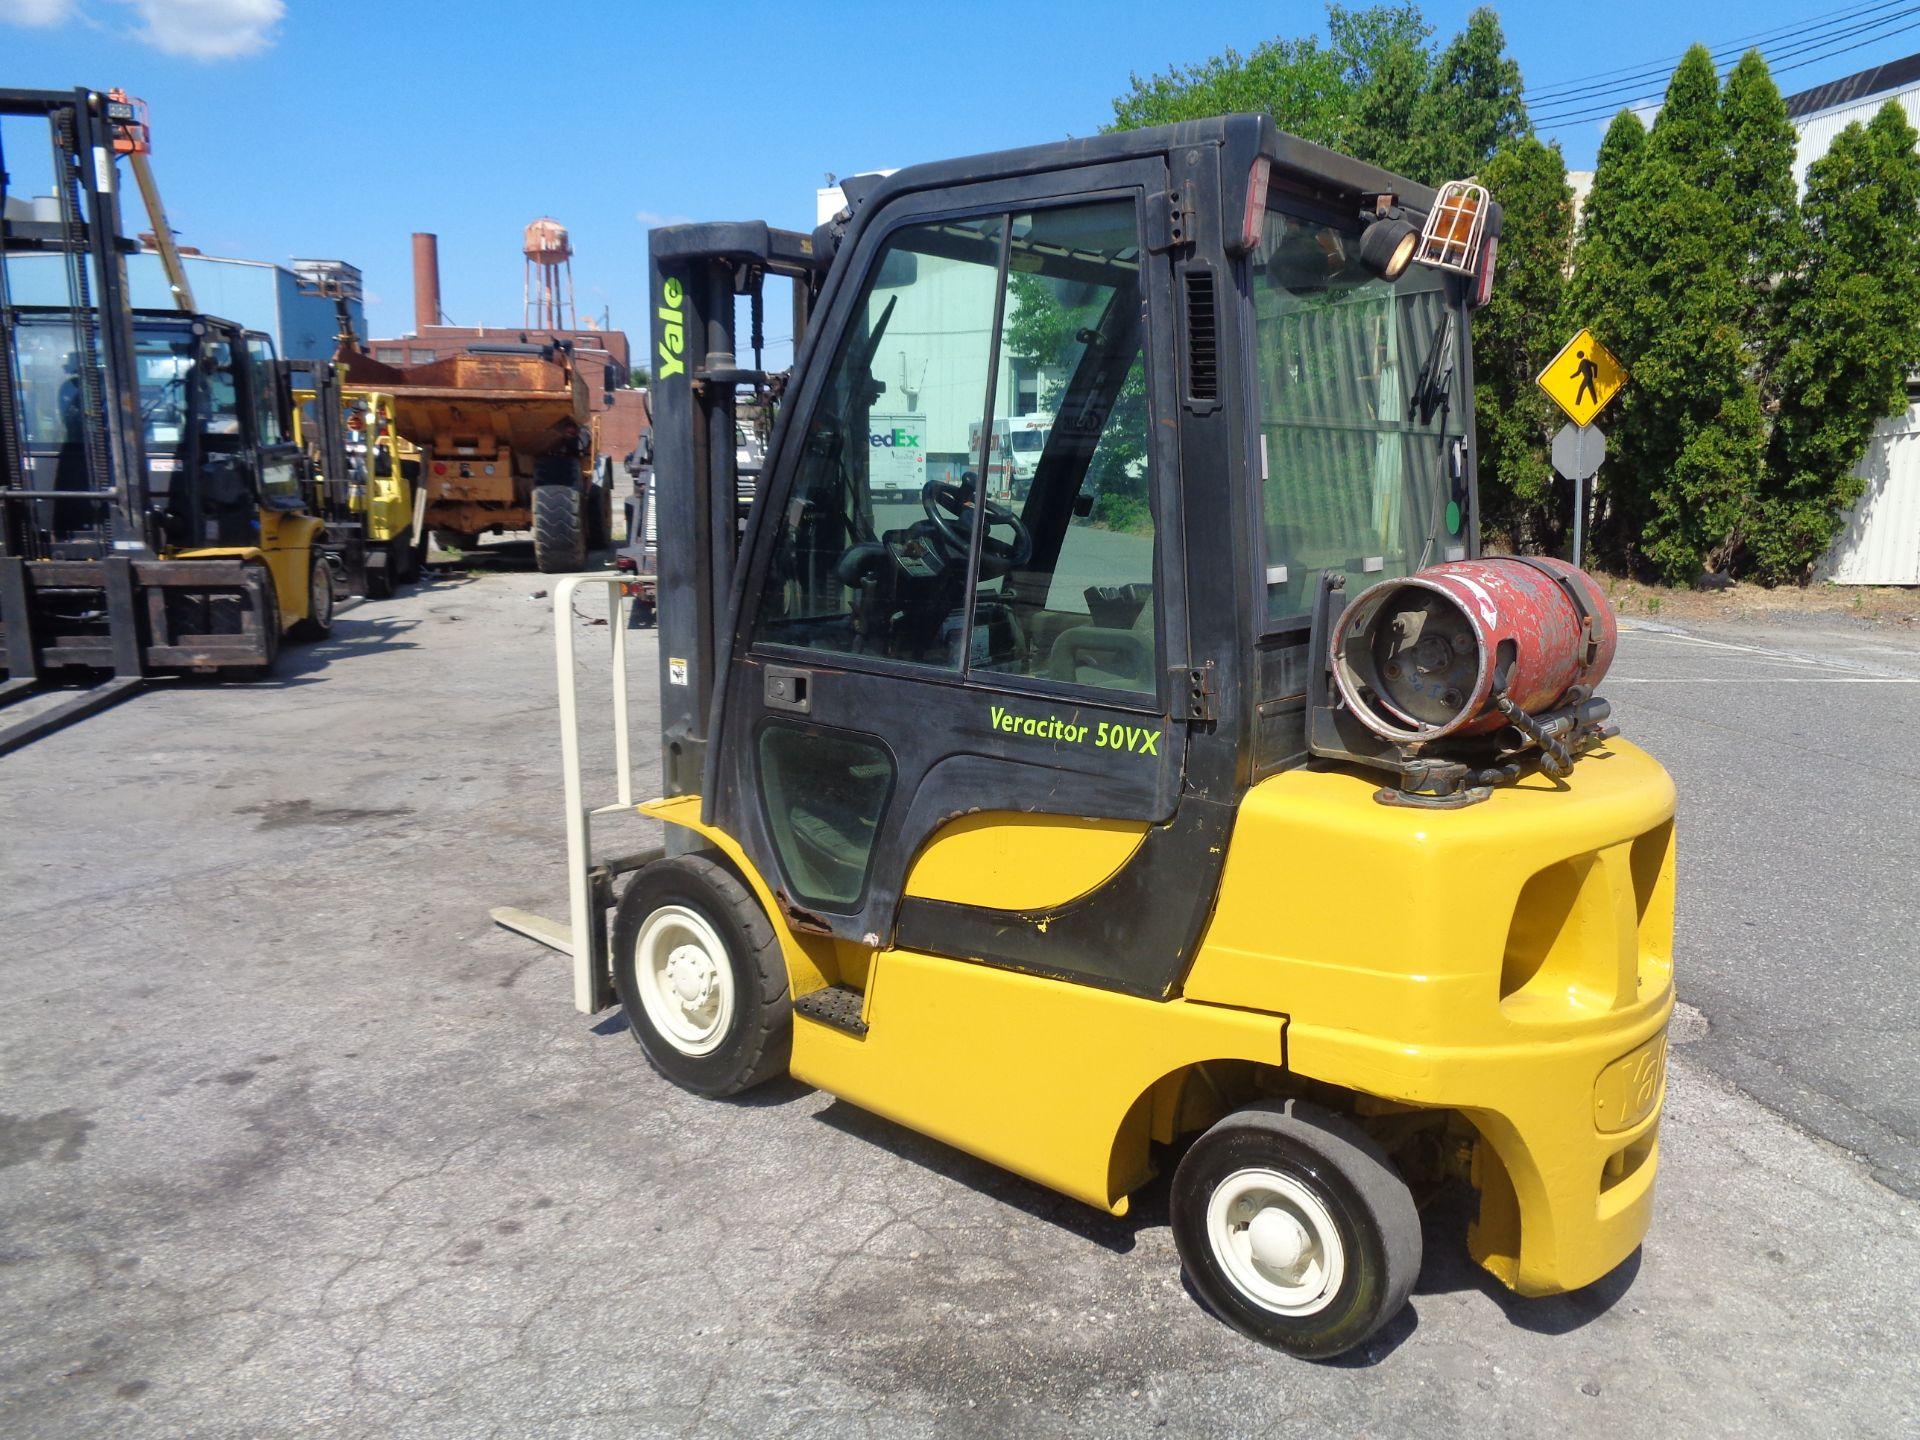 Yale GLP05VXEUSE086 5000 lb Forklift - Image 11 of 14